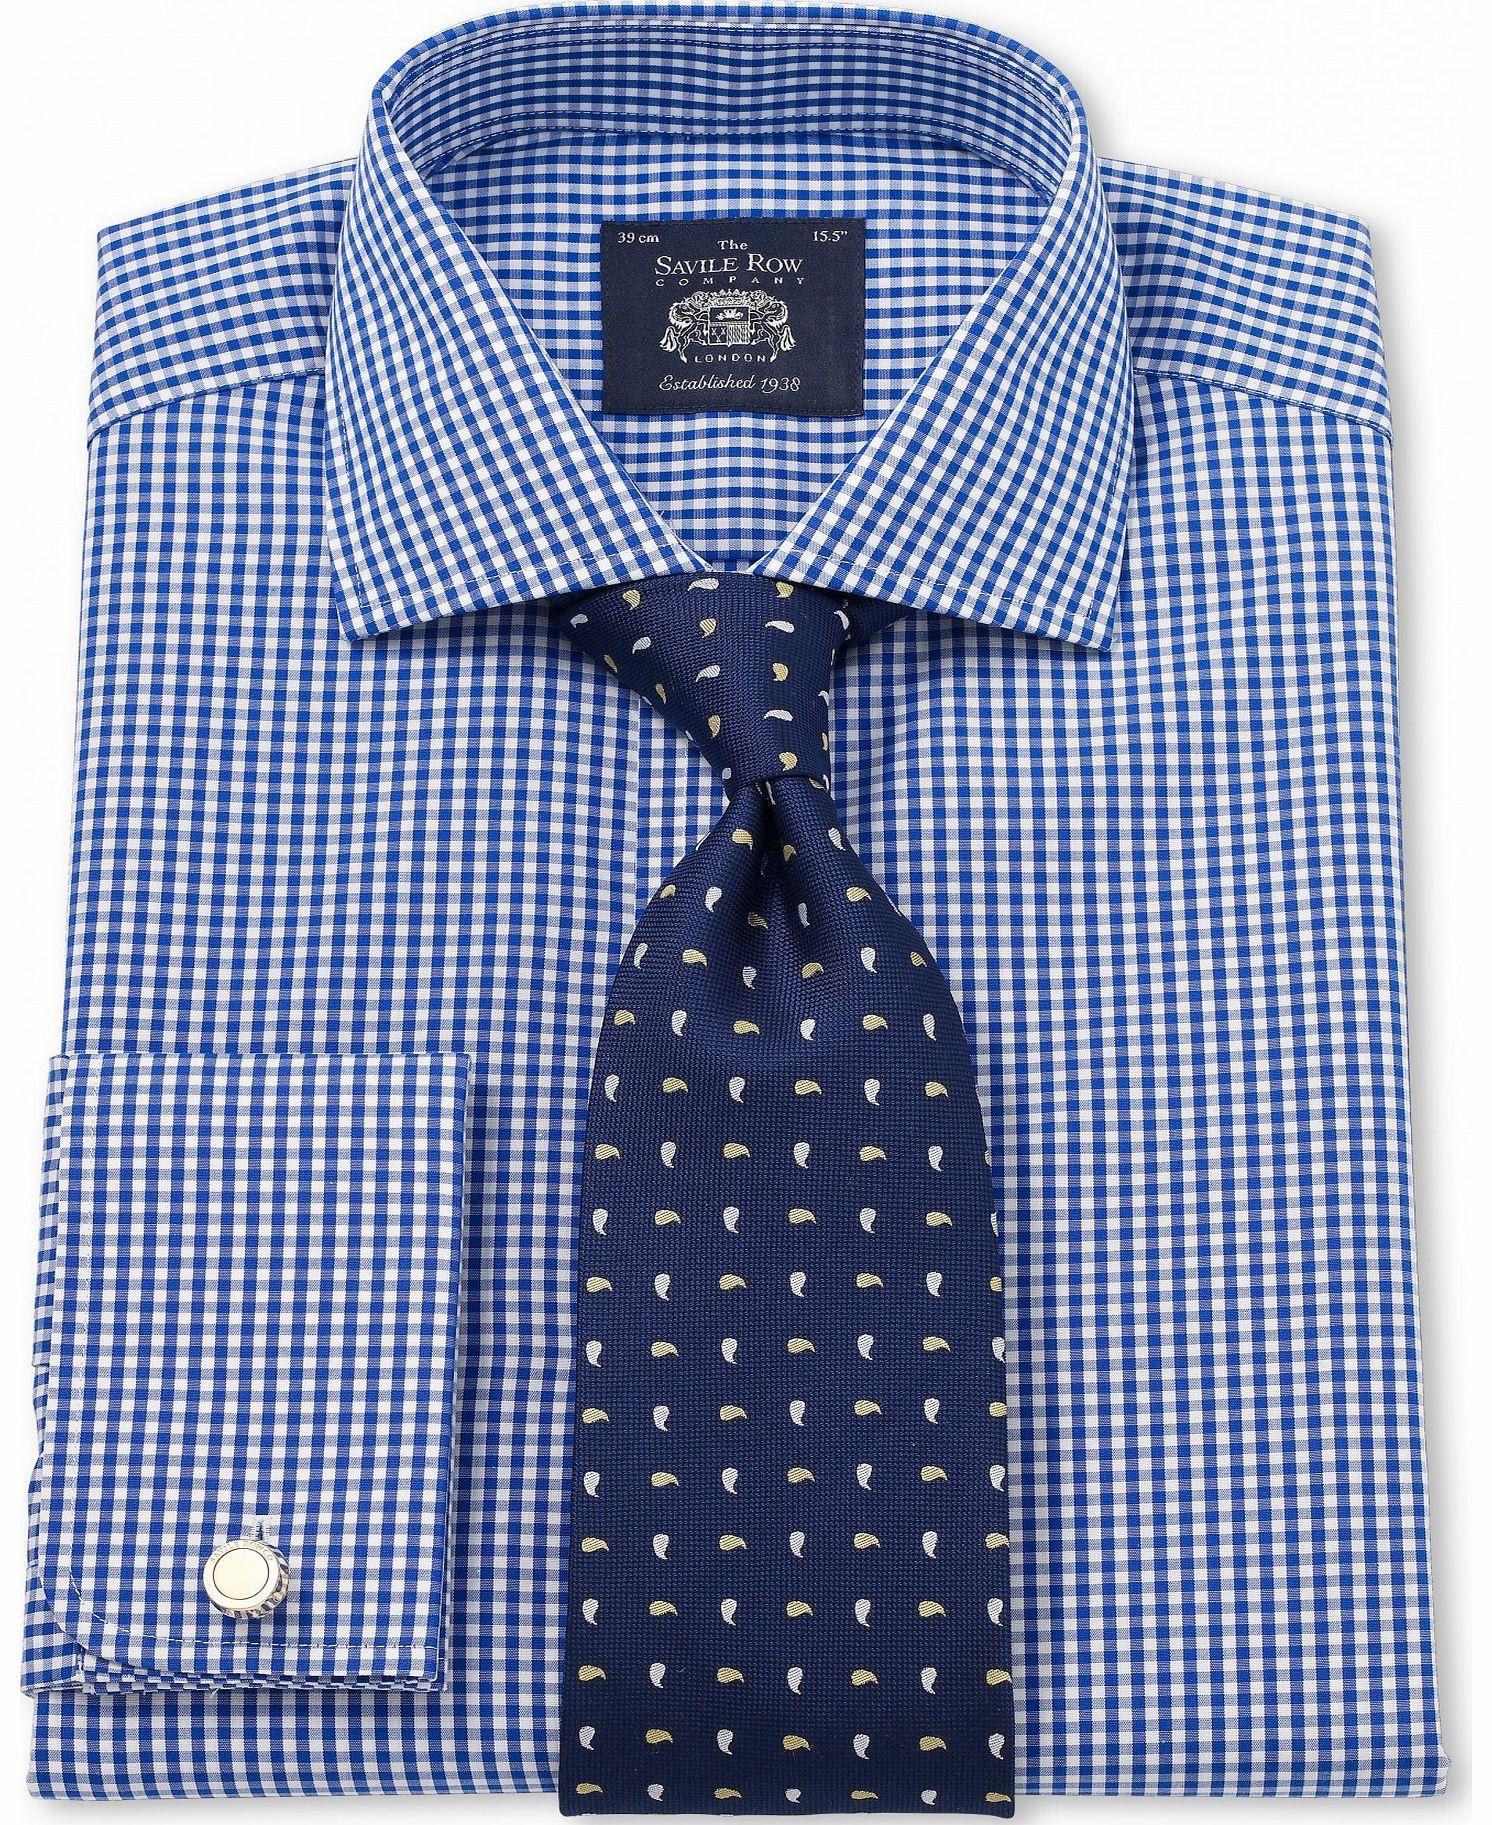 Savile row company blue white poplin gingham slim fit for Get company shirts made